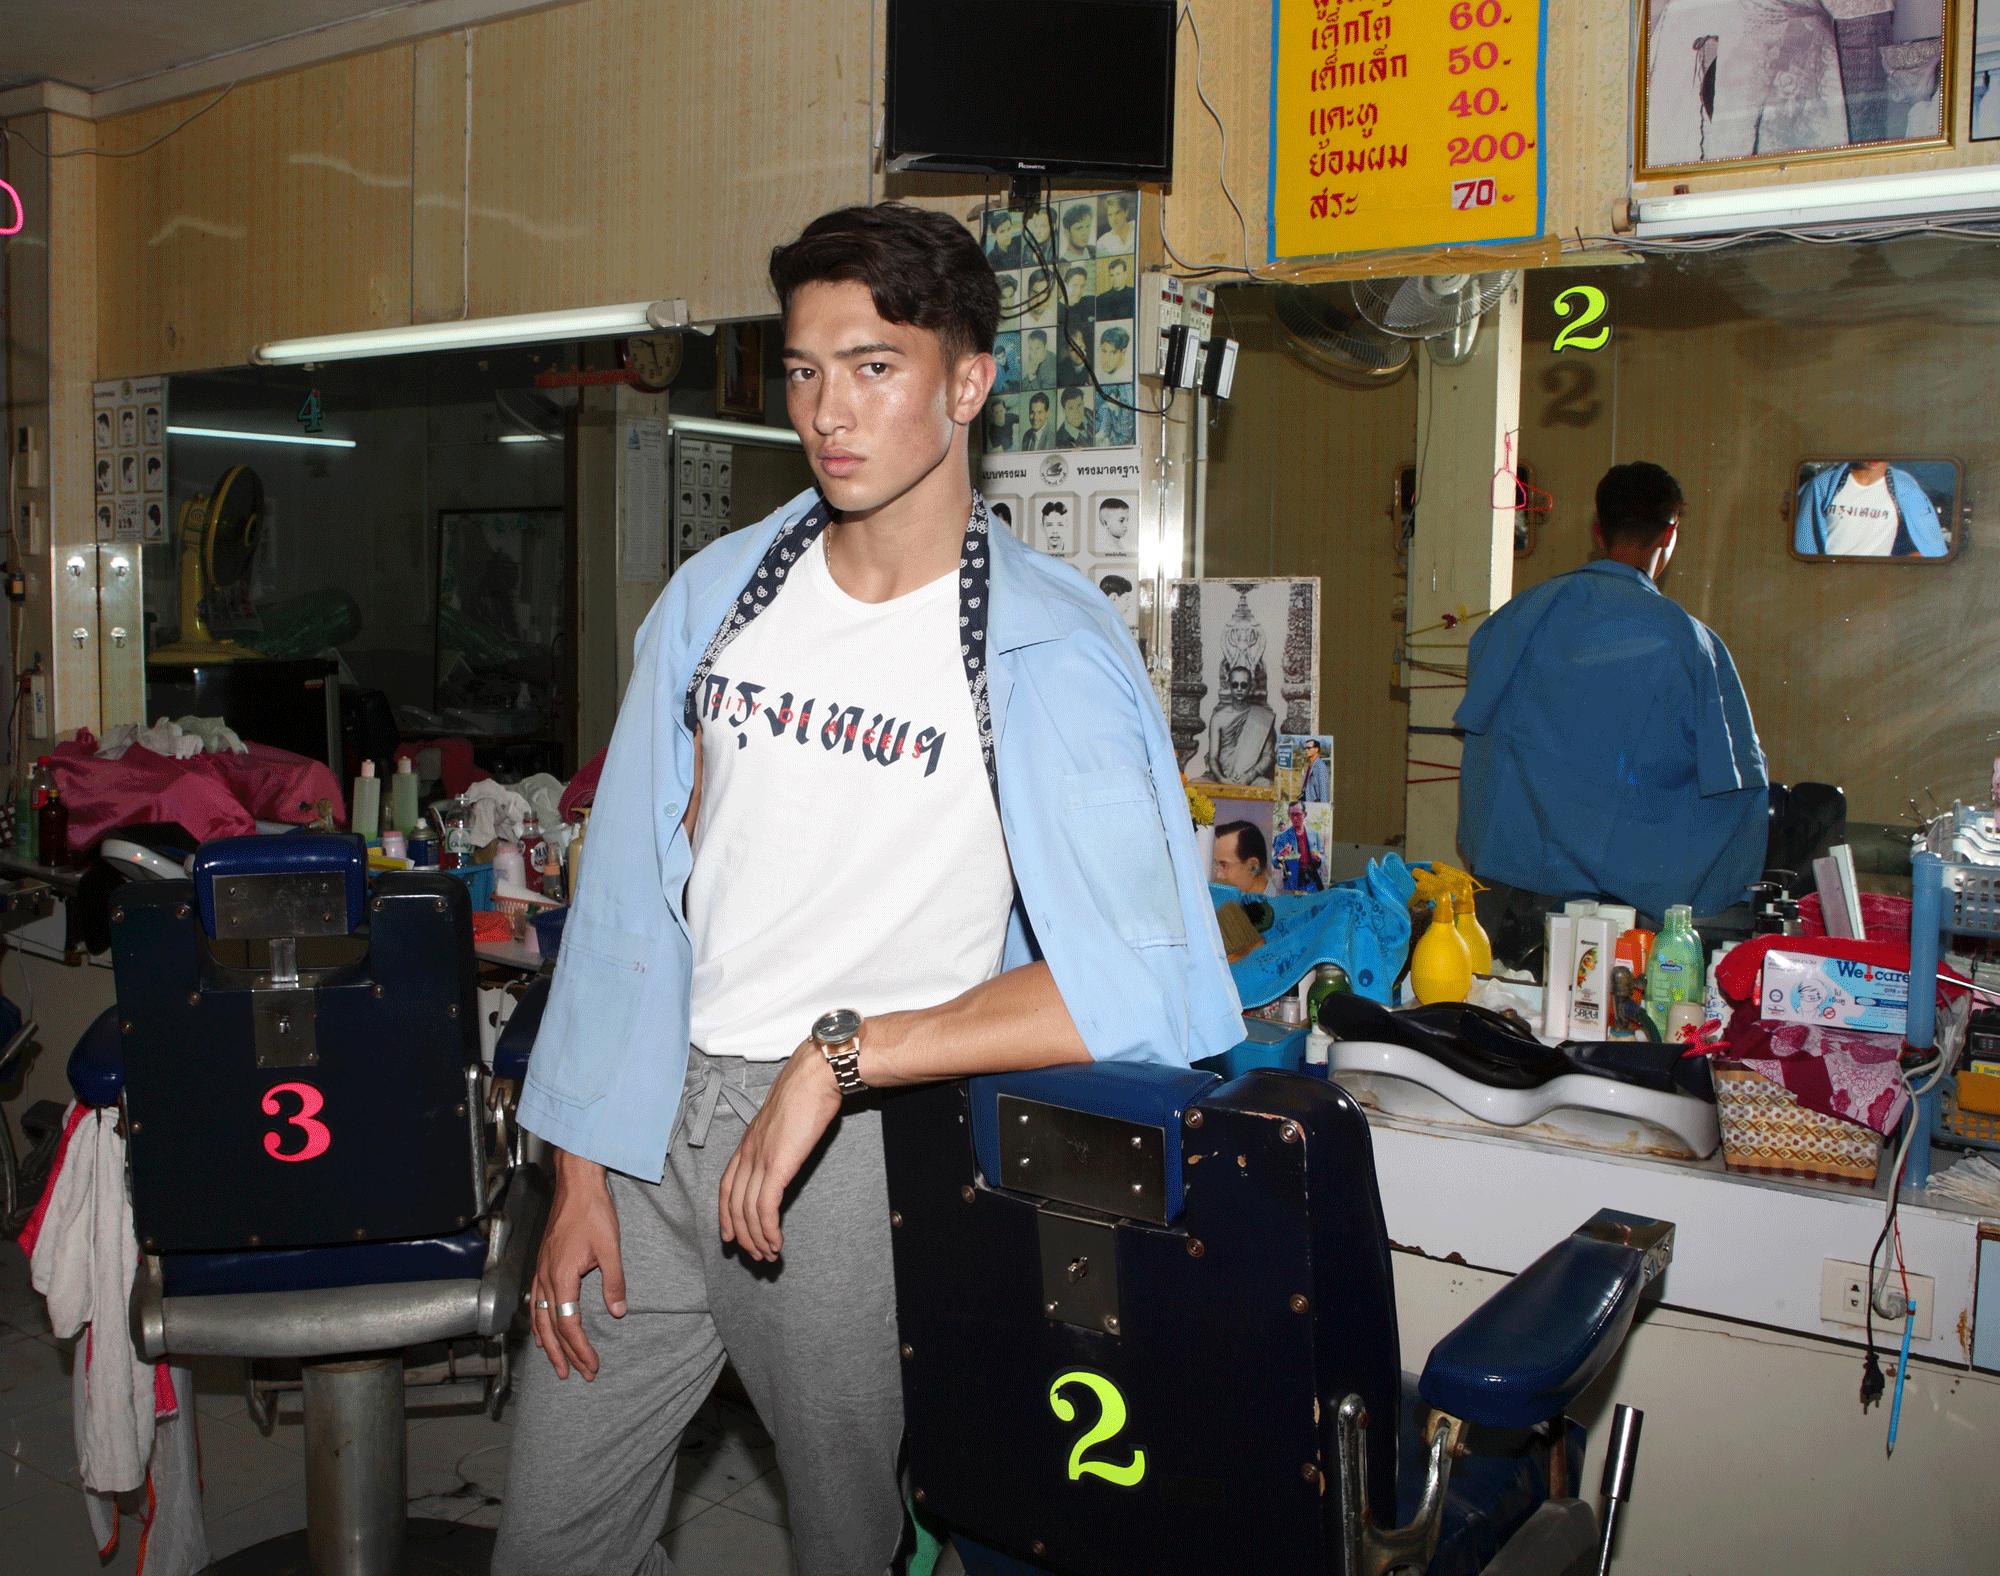 tshirt : PAINKILLER / pants : NOXX wear / watch : FORREST